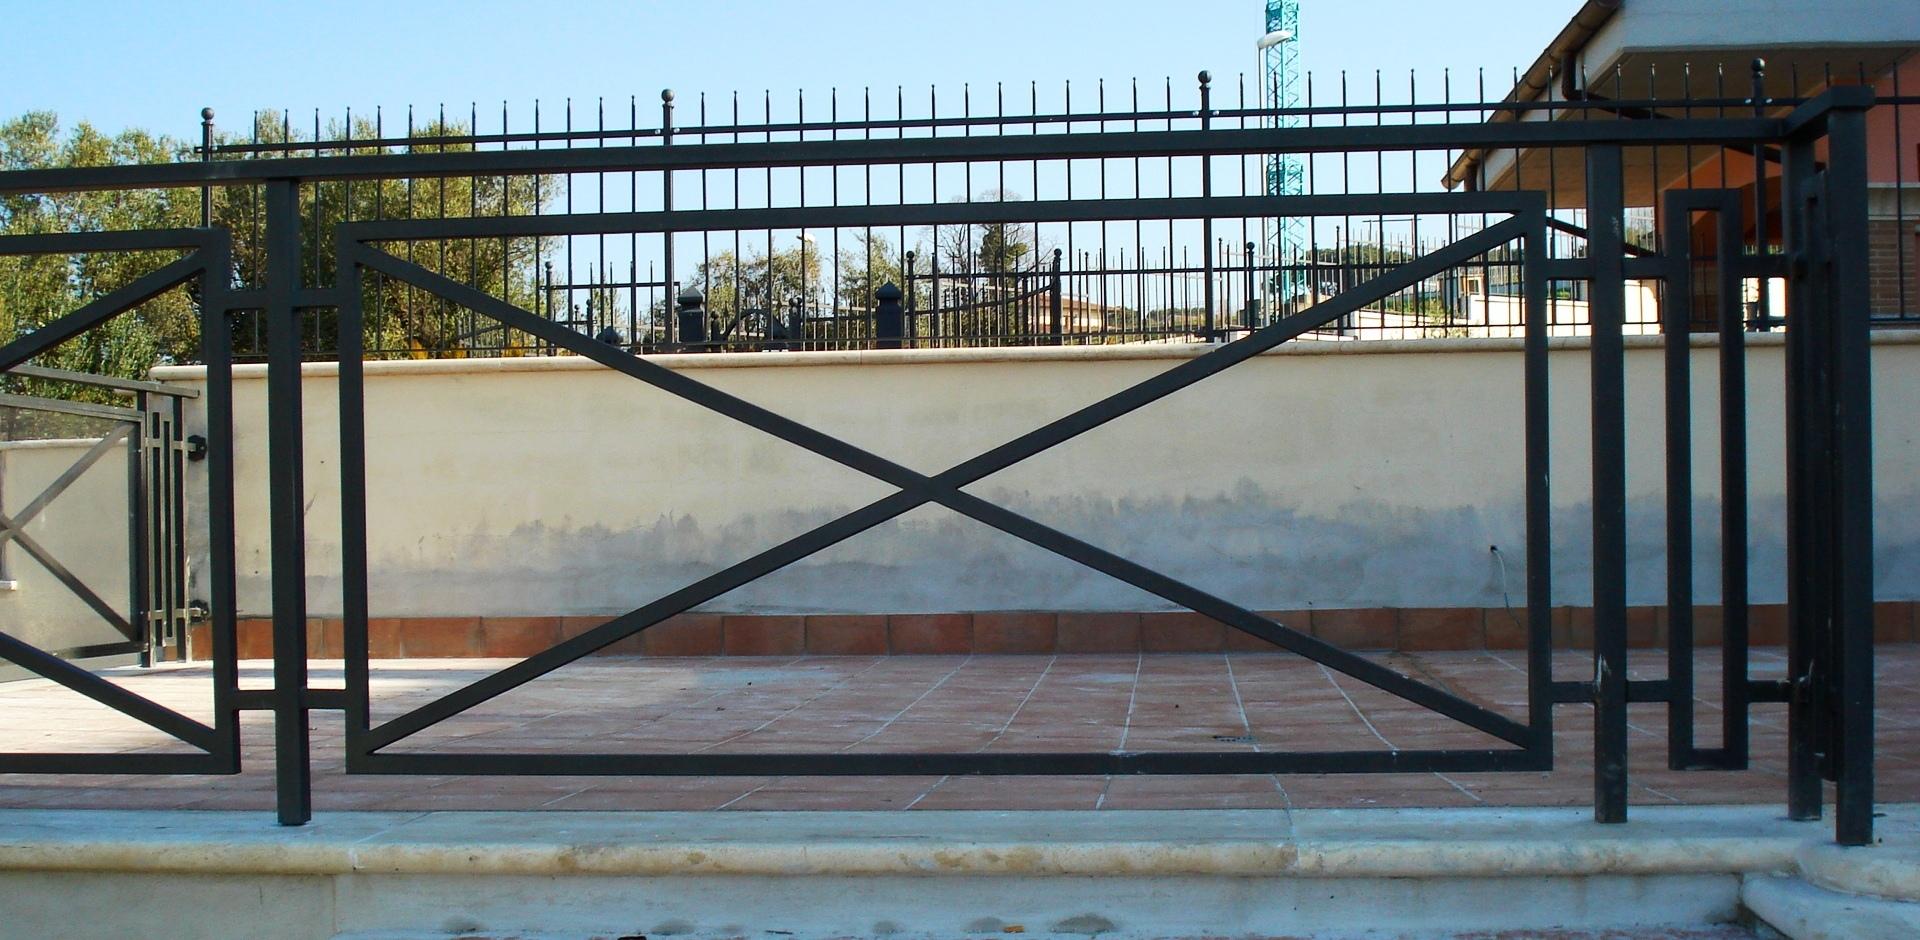 Ringhiere perucca serrande for Foto di ringhiere in ferro battuto